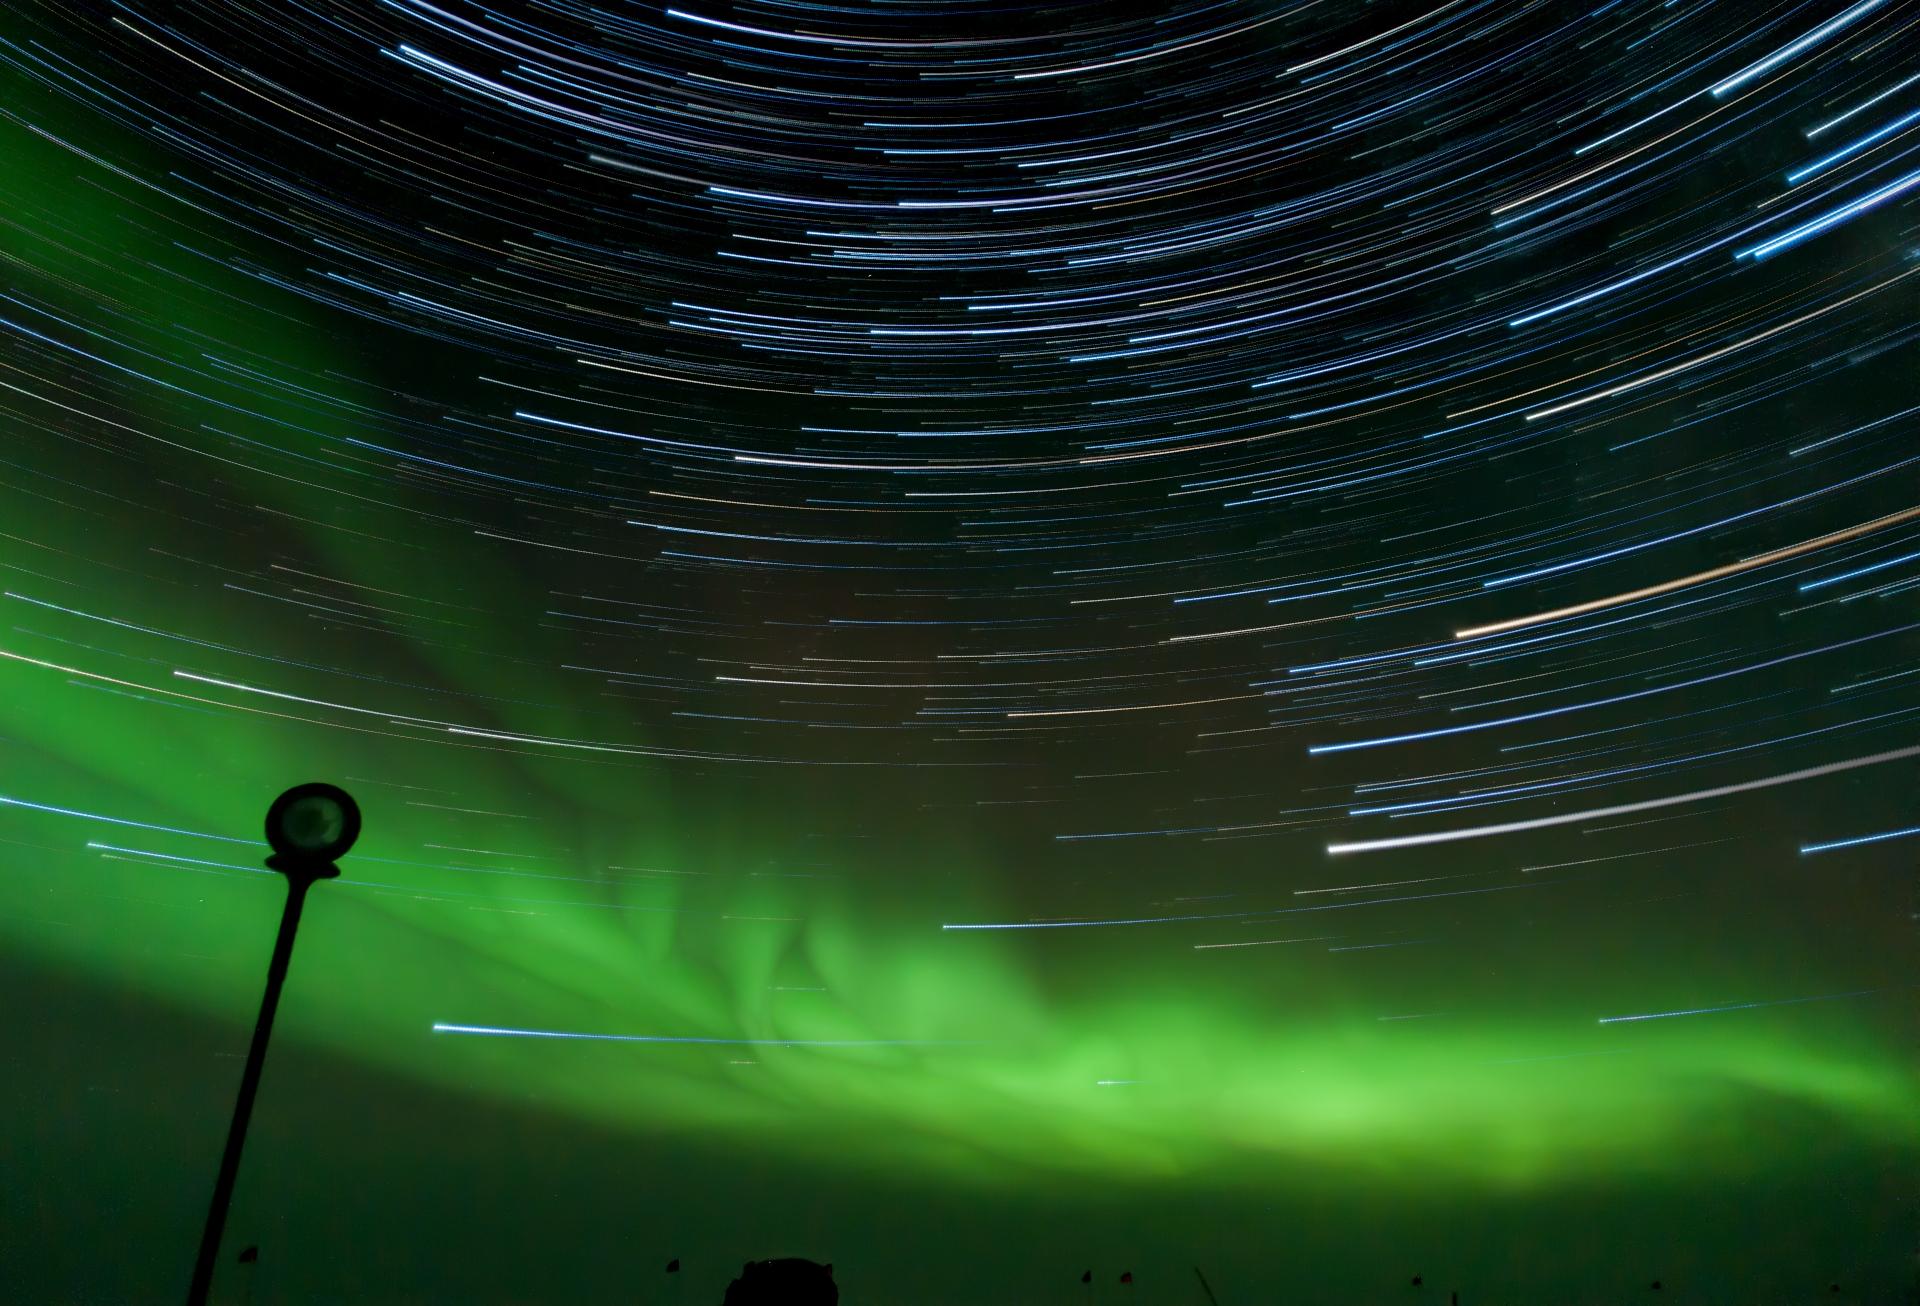 Star trails